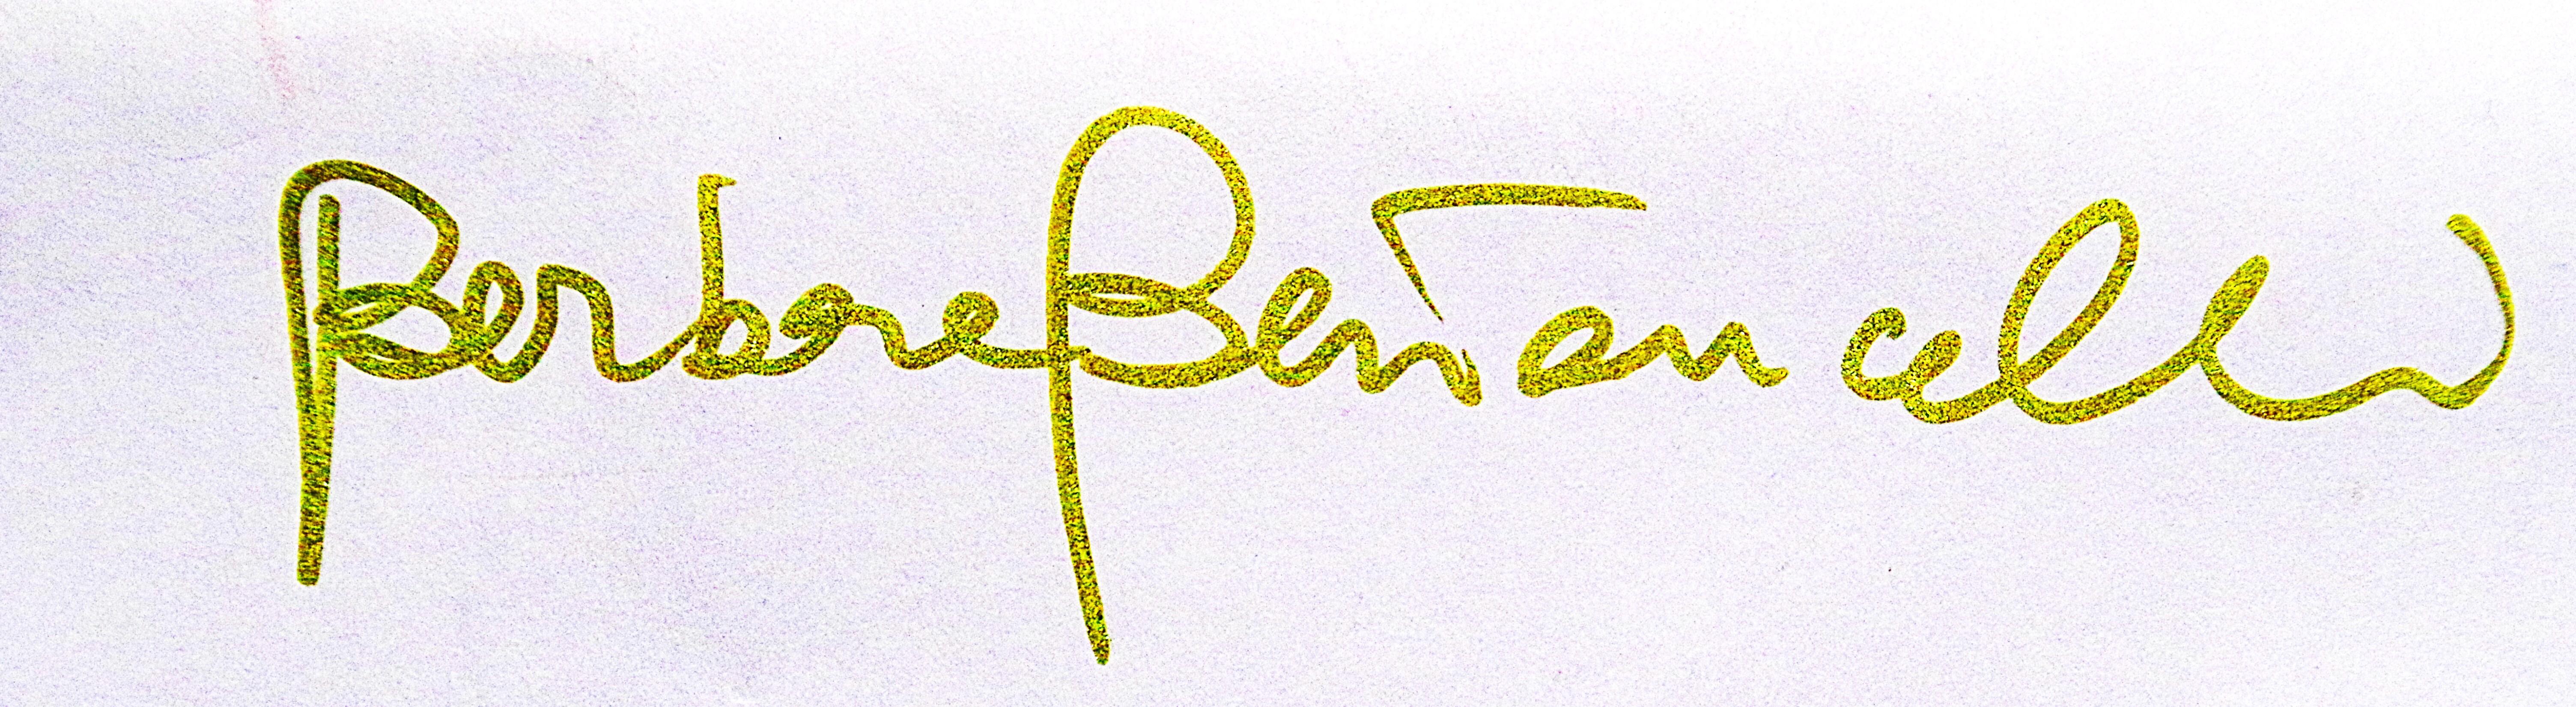 barbara bertoncelli Signature